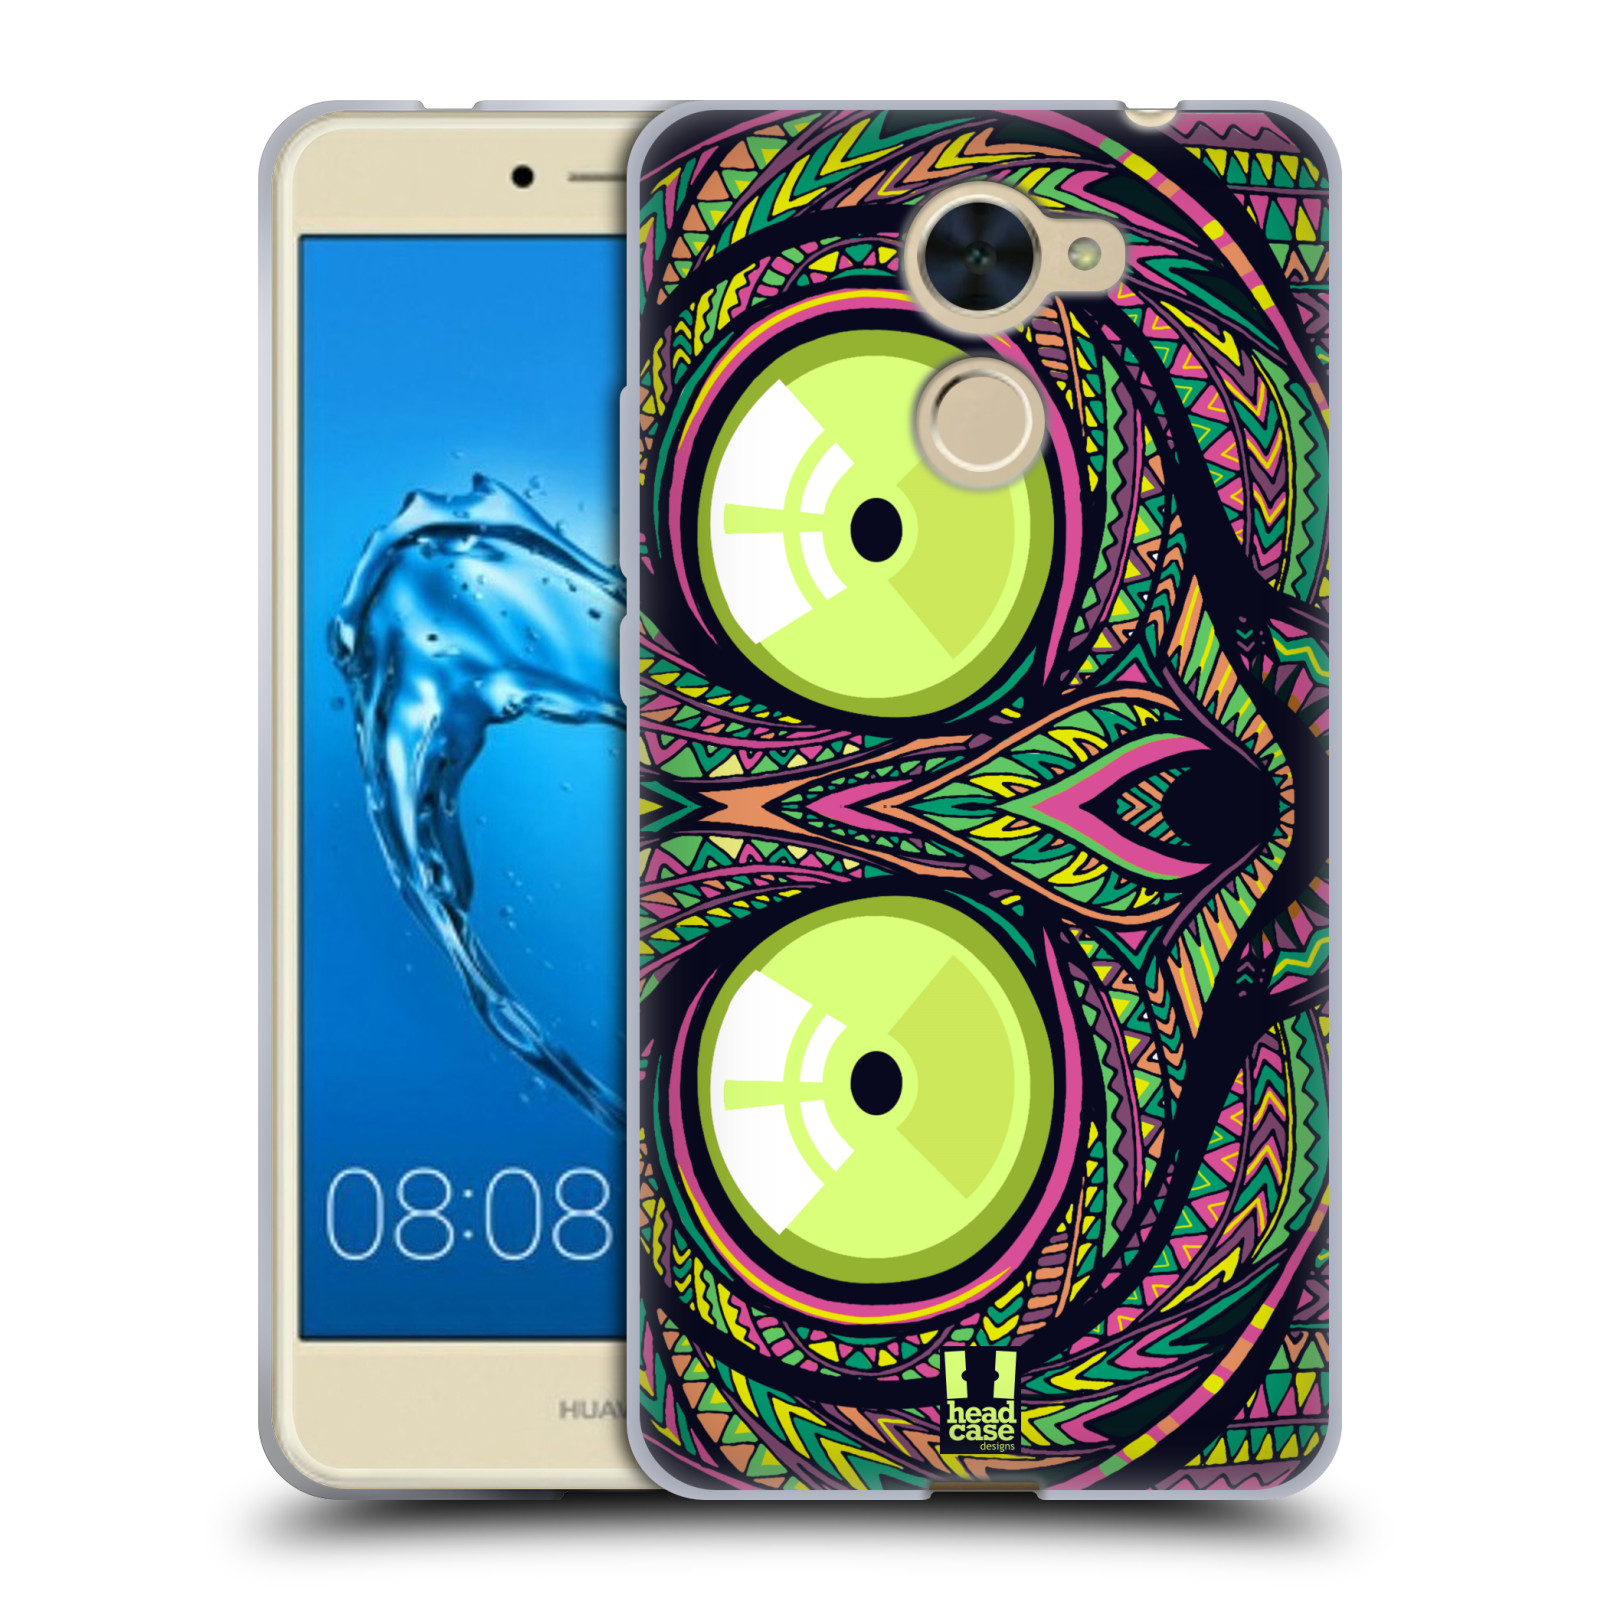 Silikonové pouzdro na mobil Huawei Y7 - Head Case - AZTEC NÁRTOUN